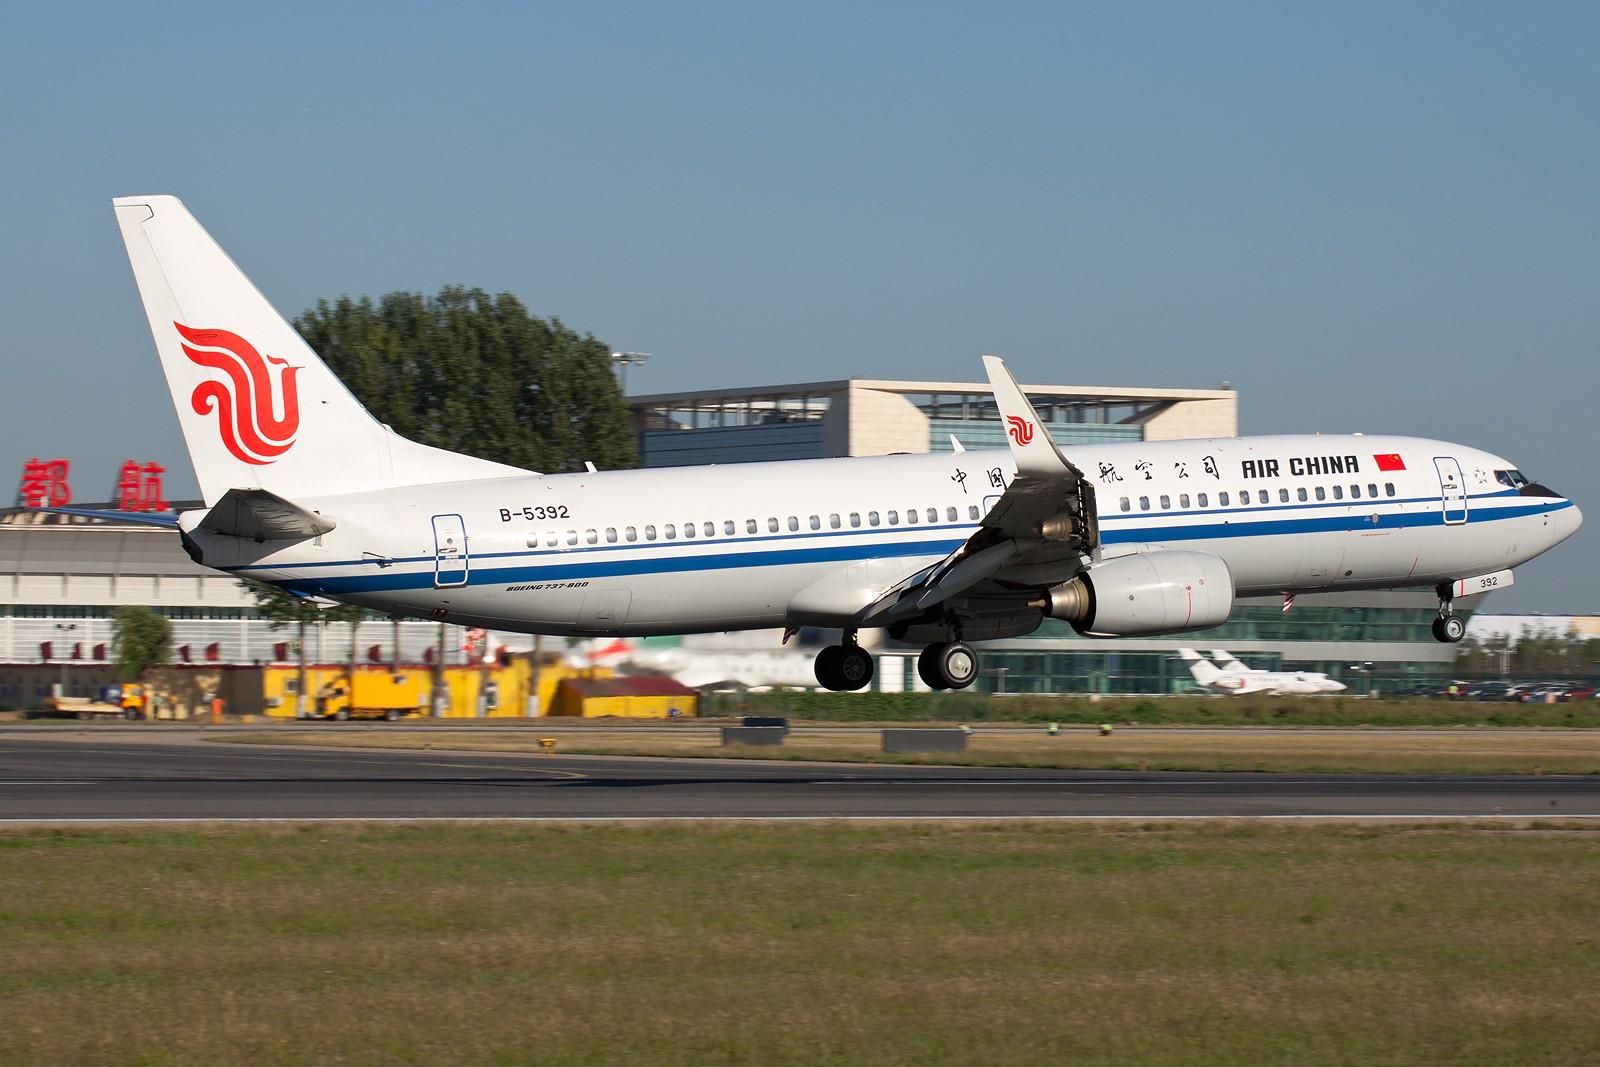 Re:[原创]国航一组 B737&A320系列 [10pics] BOEING 737-800 B-5392 中国北京首都机场